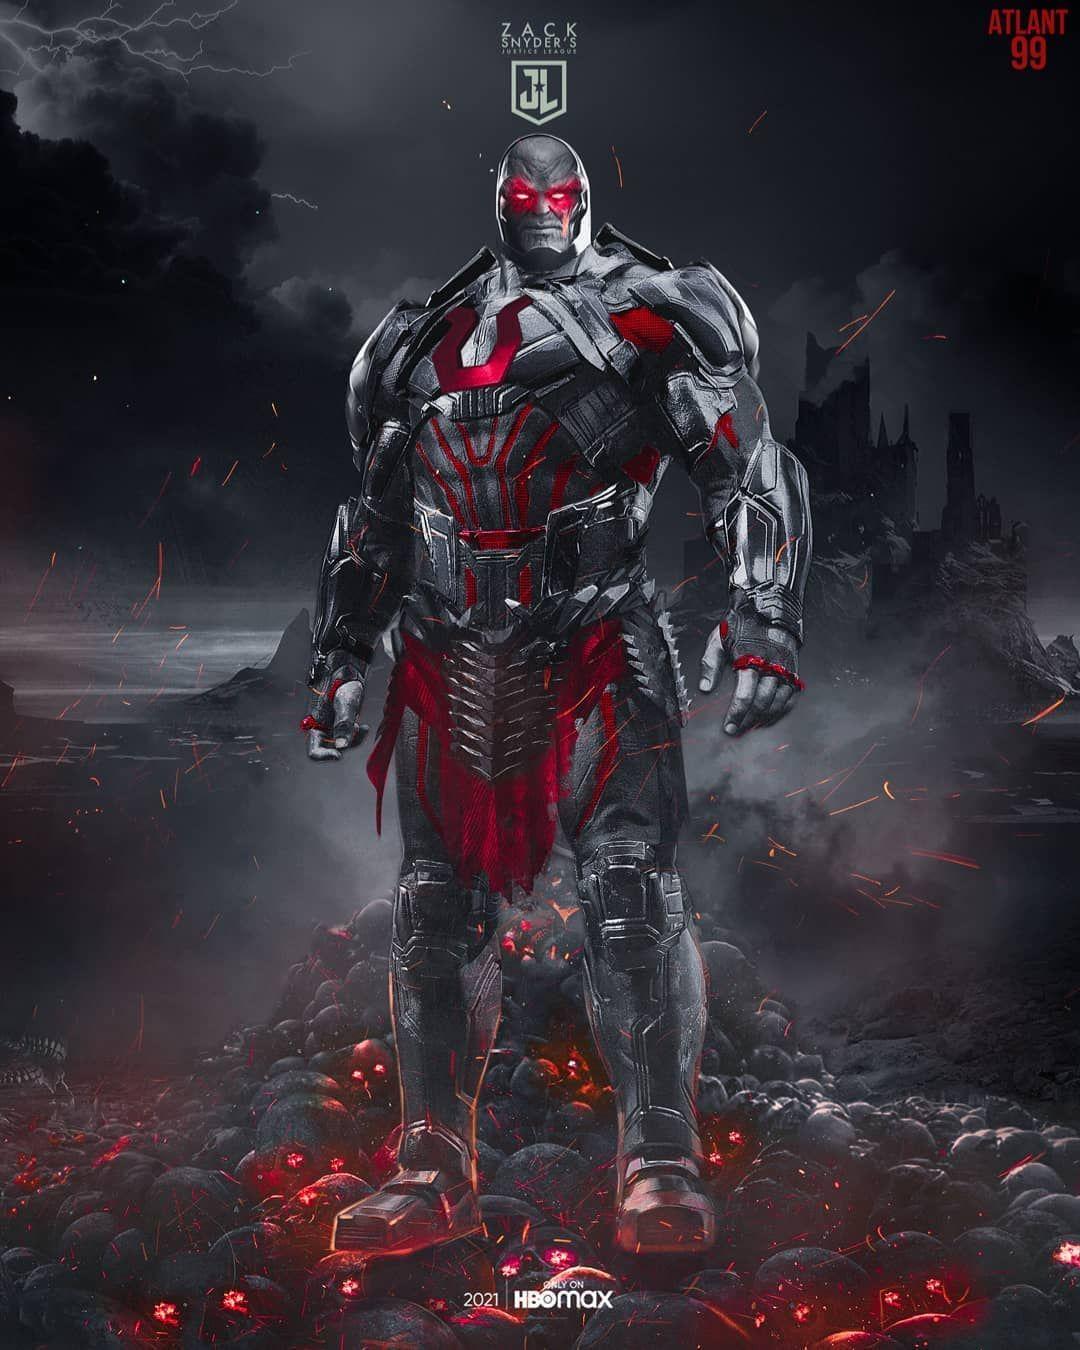 A T L A N T On Instagram Darkseid 1 4 Zack Snyder S Justice League Hbomax 2021 Dccomics Hbom In 2020 Darkseid Dc Comics Dc Comics Wallpaper Batman Superman Comic